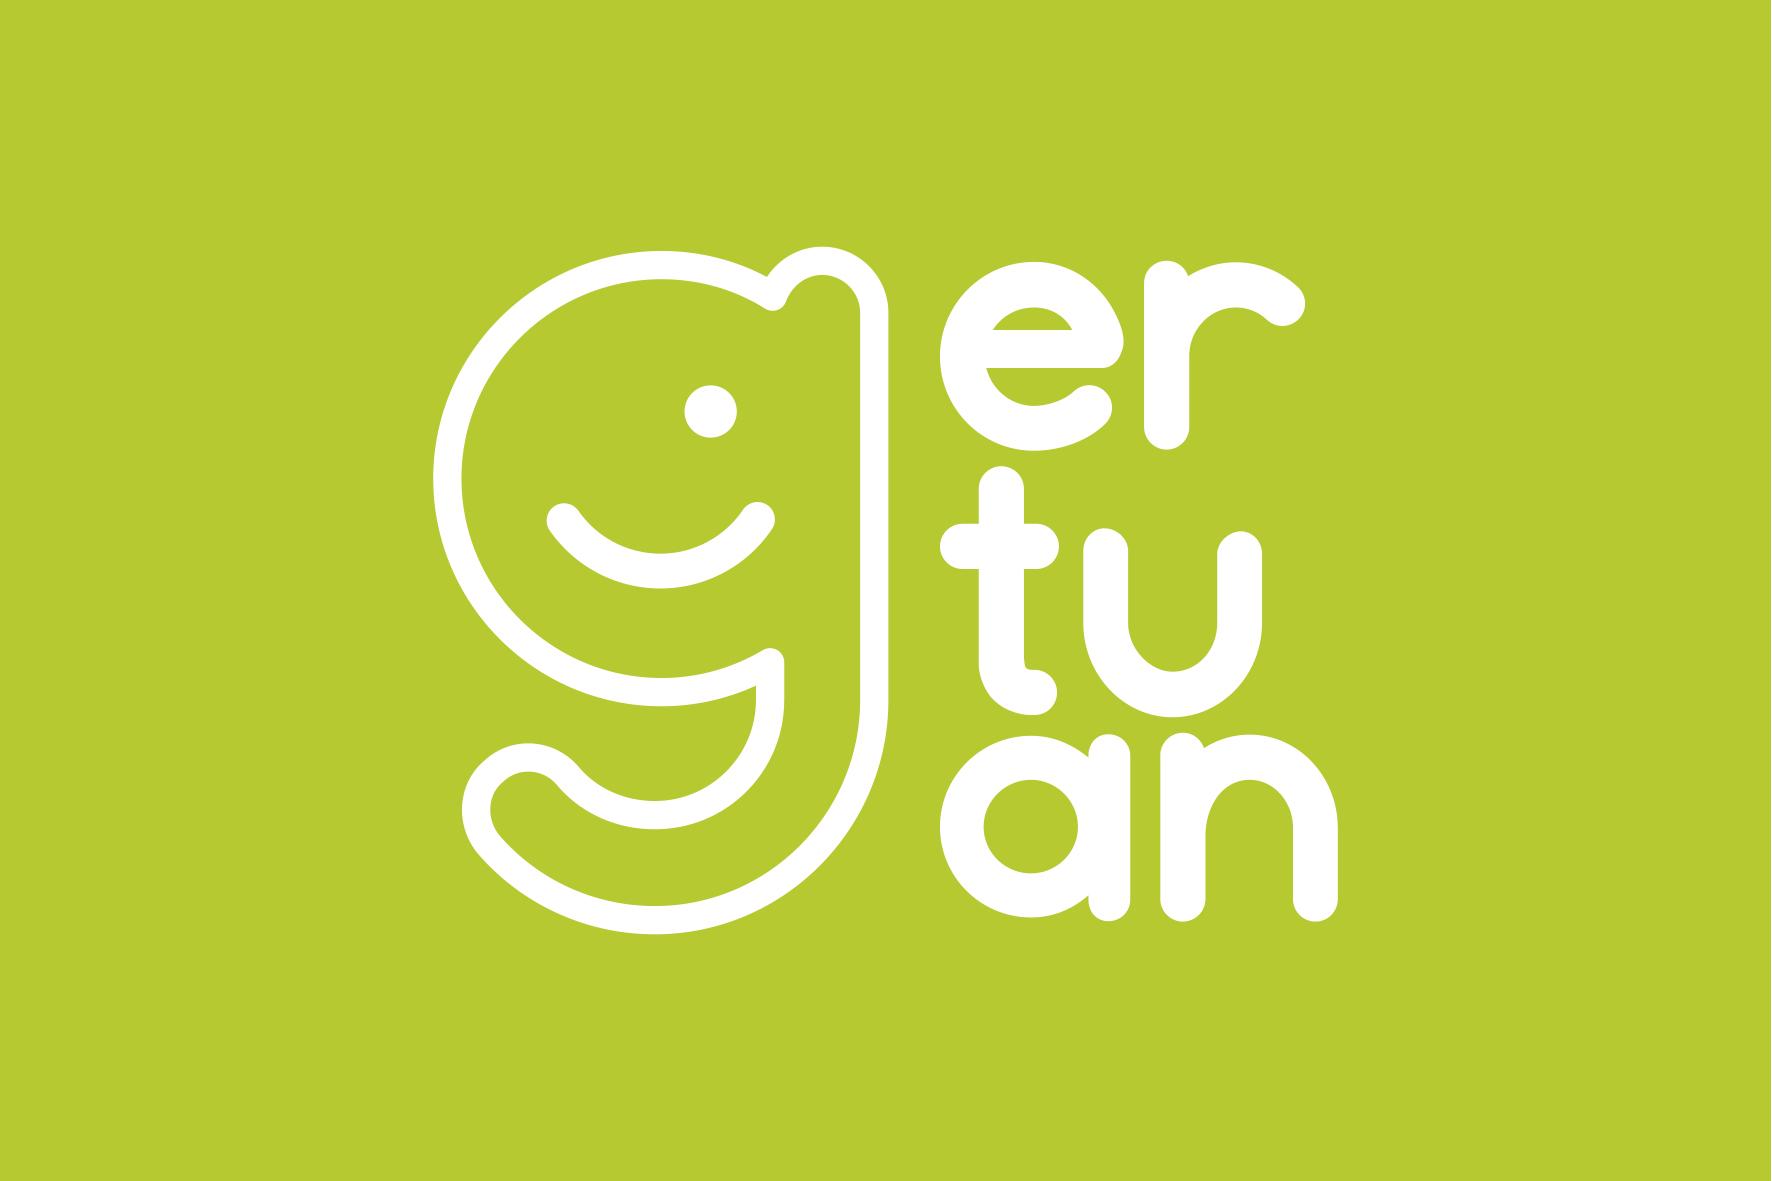 logo_GERTUAN_mockup_2